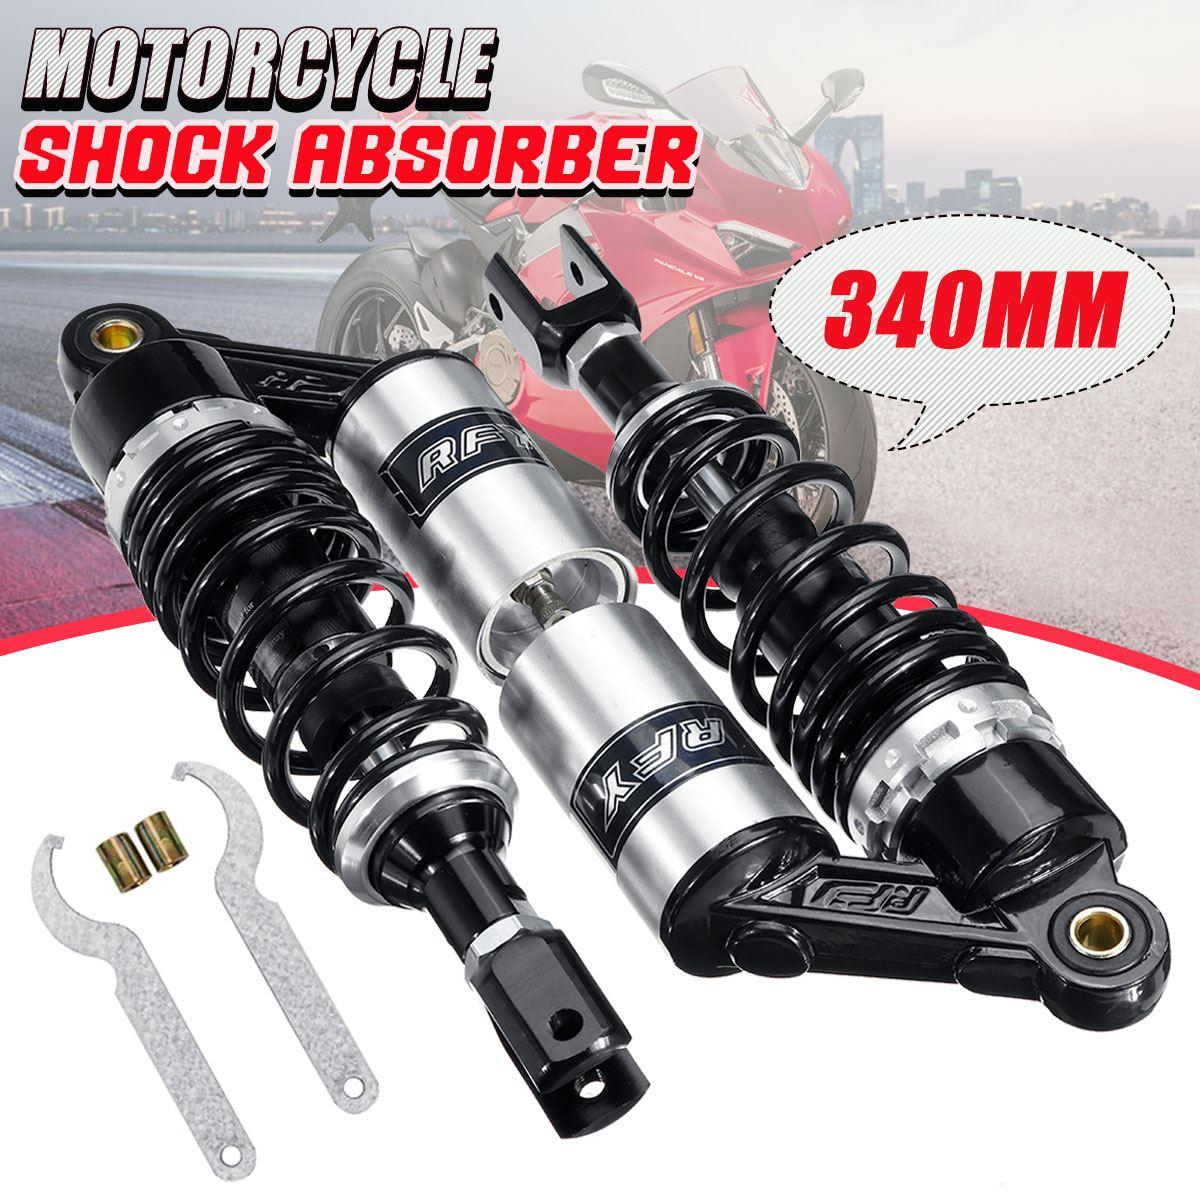 "Pair 13.5"" 340mm Motorcycle Air Shock Absorber Rear Suspension For 150CC-750CC Street Bike Go-kart Quad Motocross"